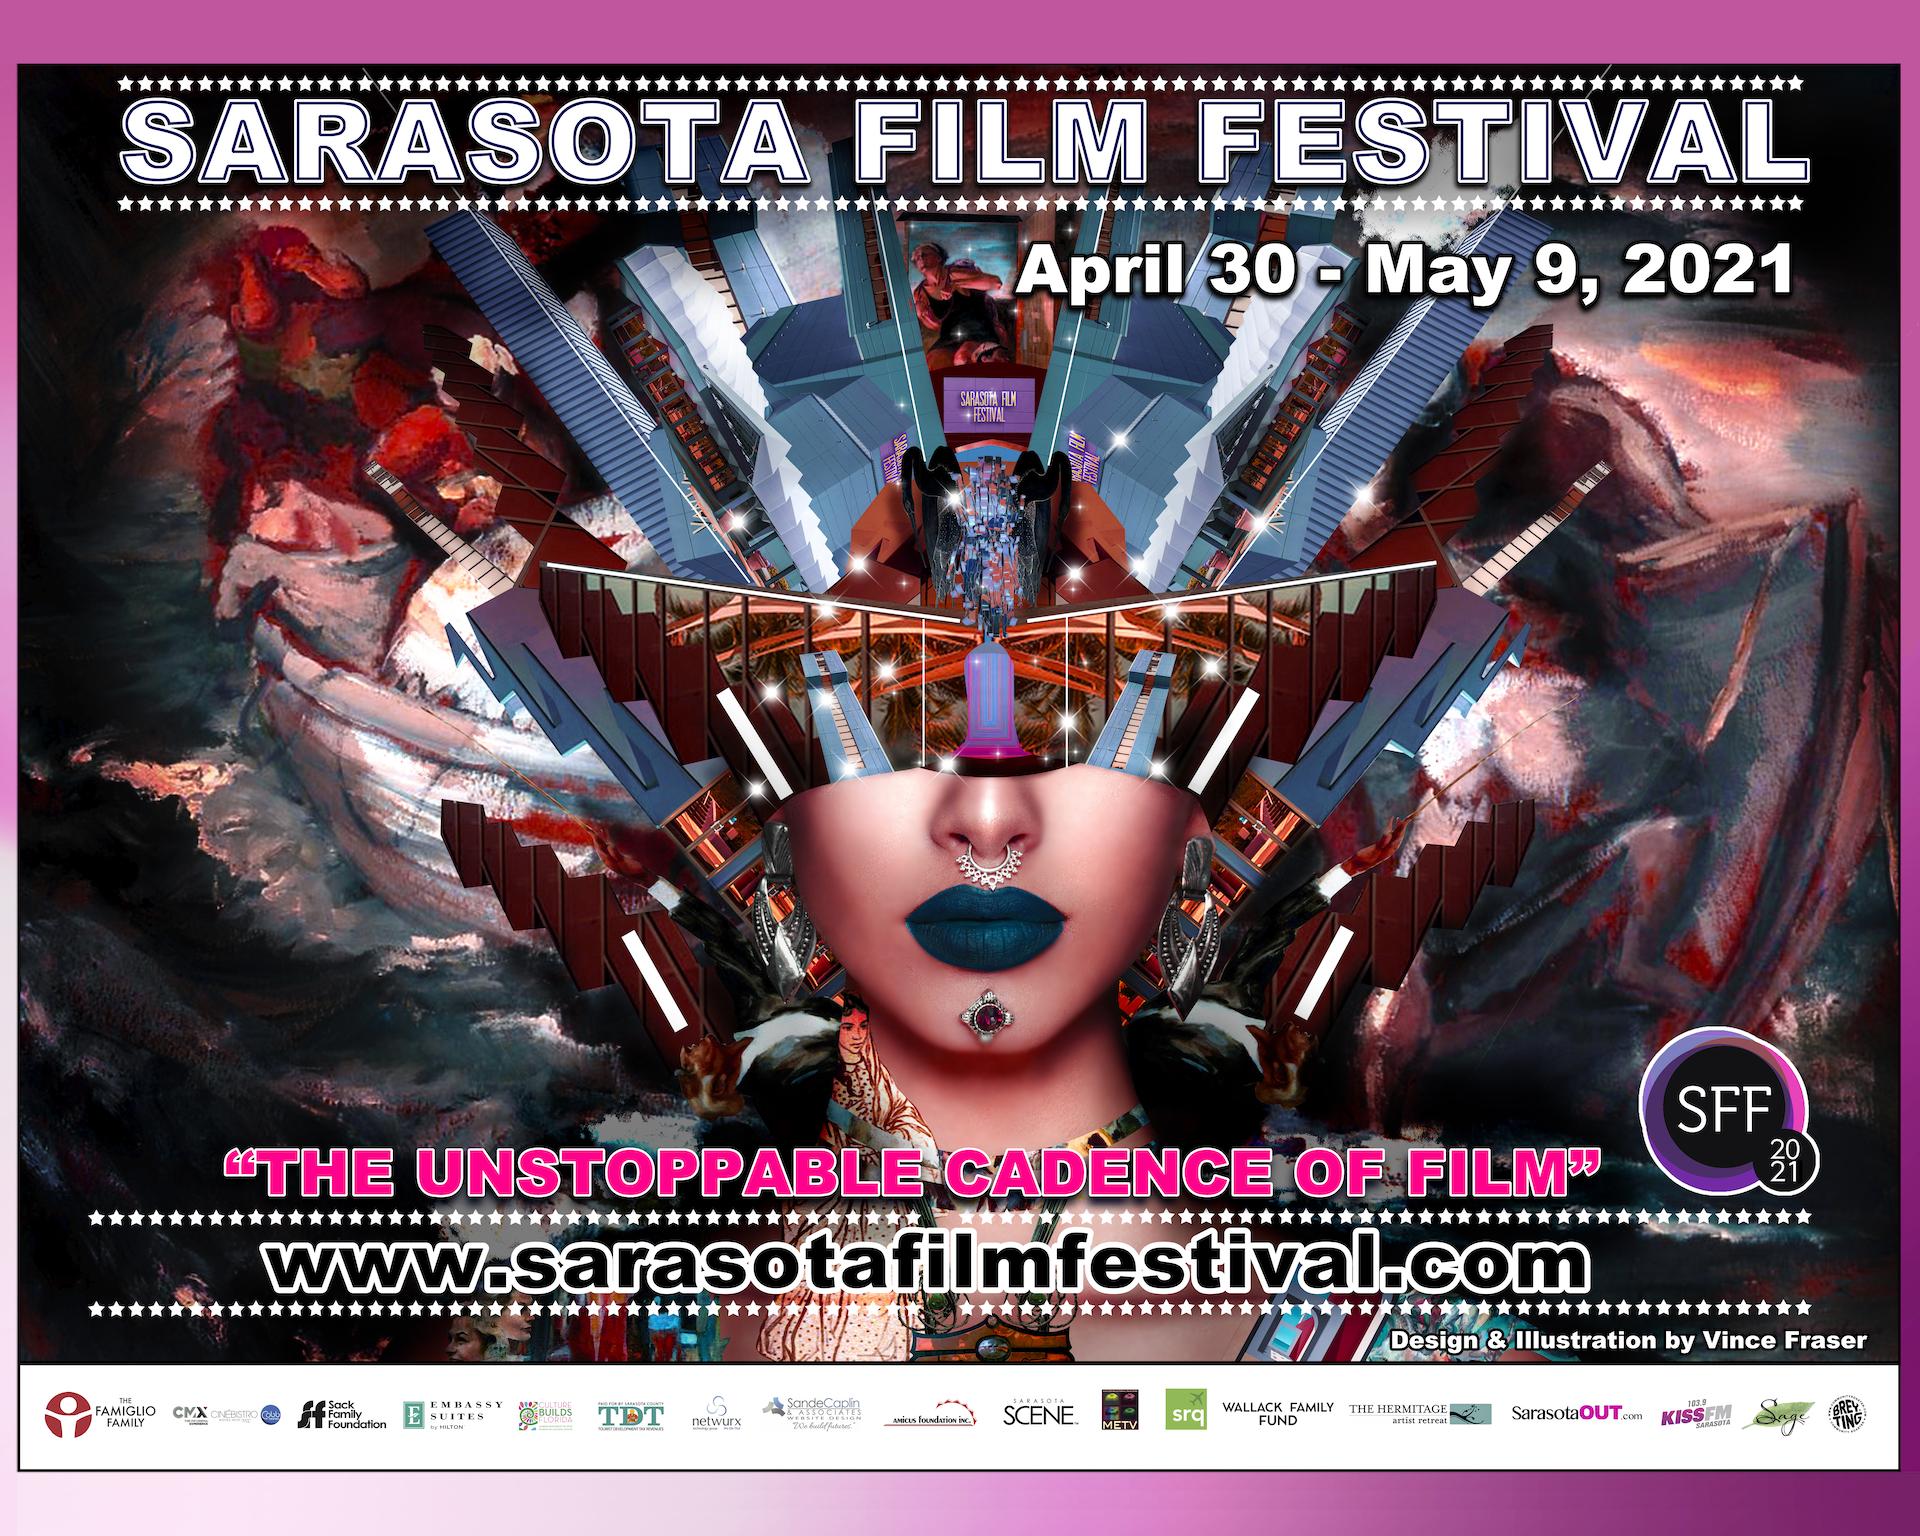 2021 Sarasota Film Festival